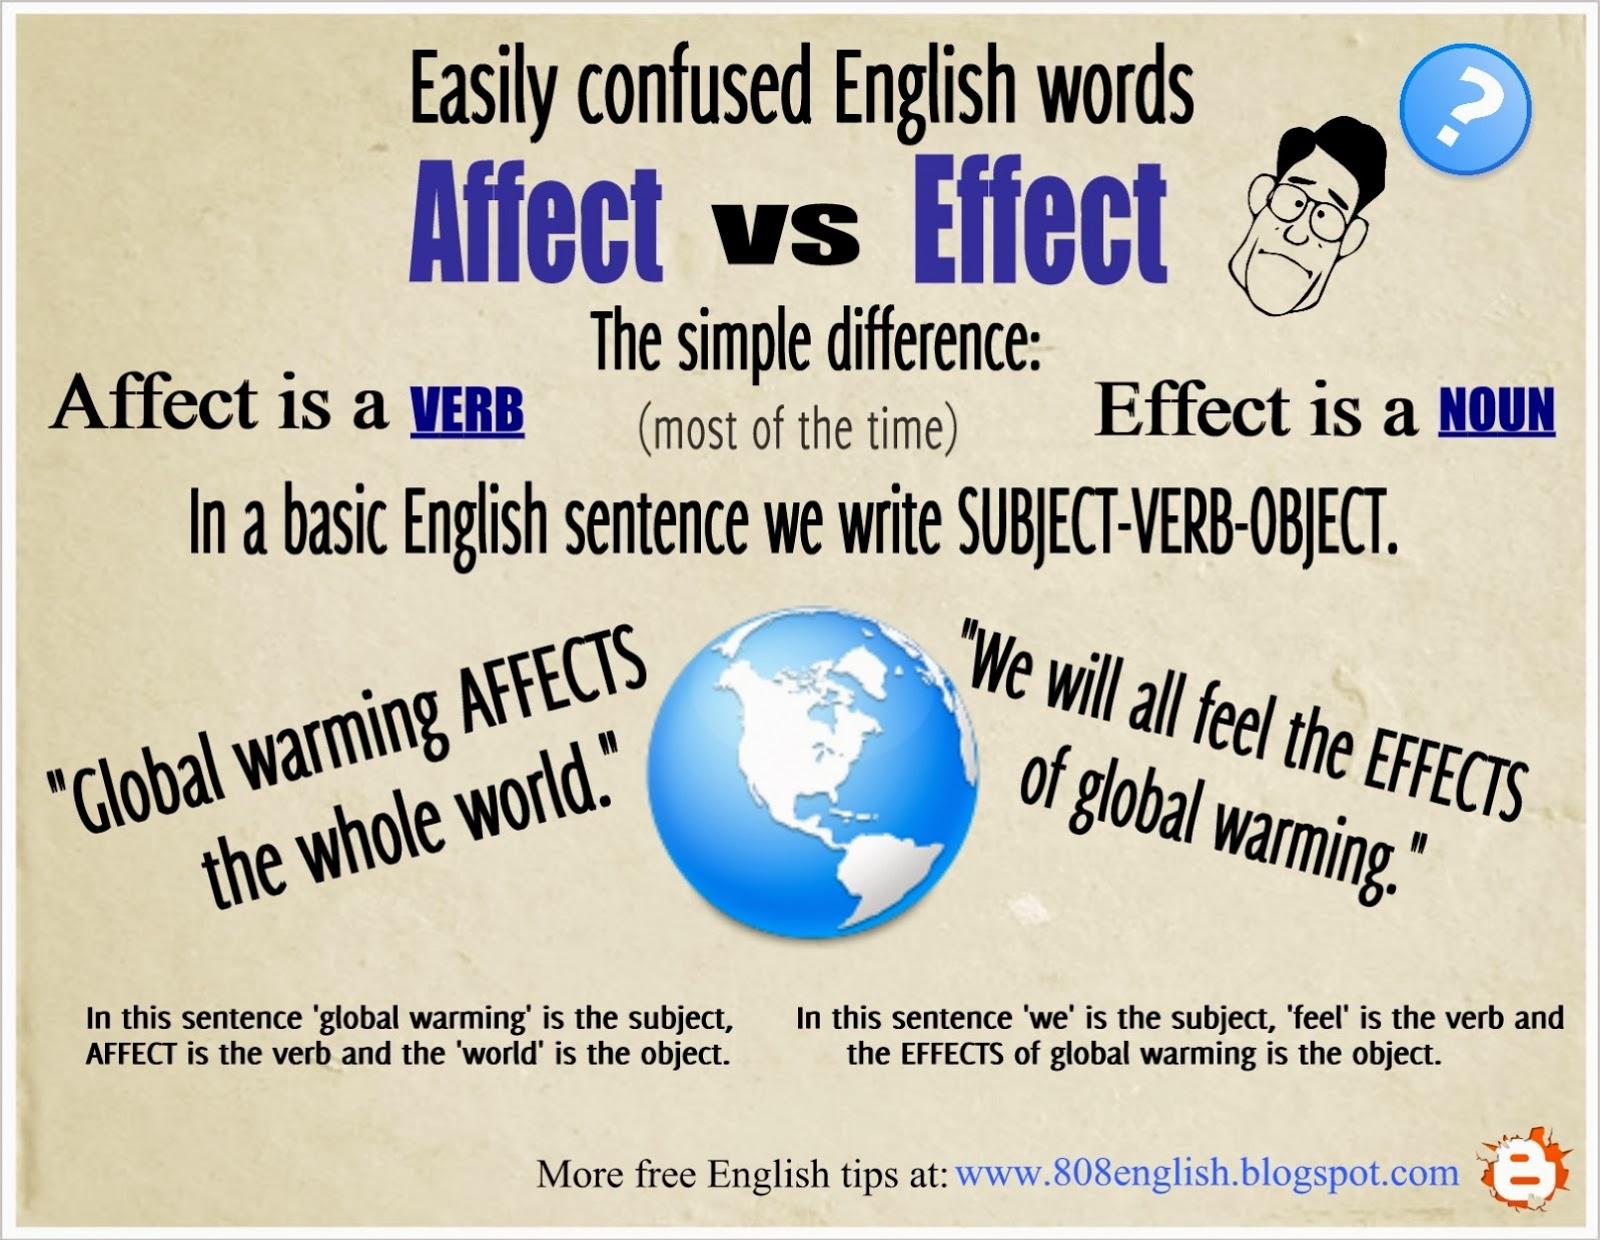 World English 808